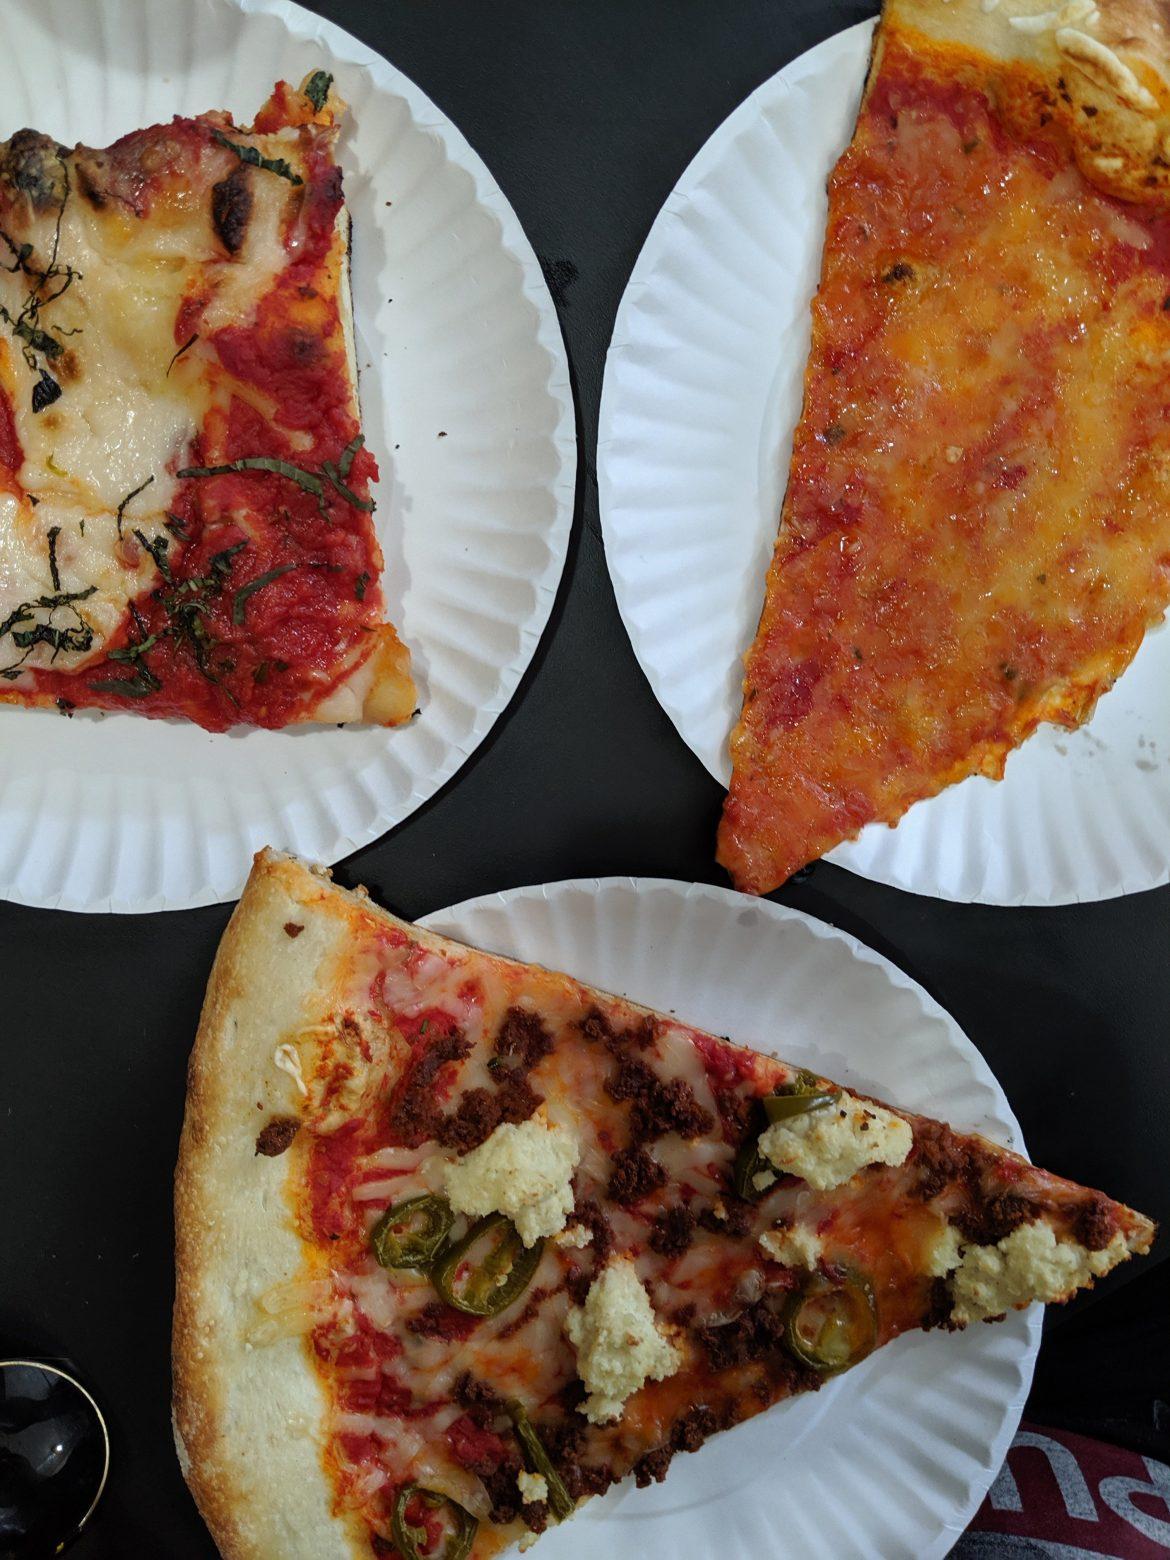 vegan pizza at Screamers Pizza